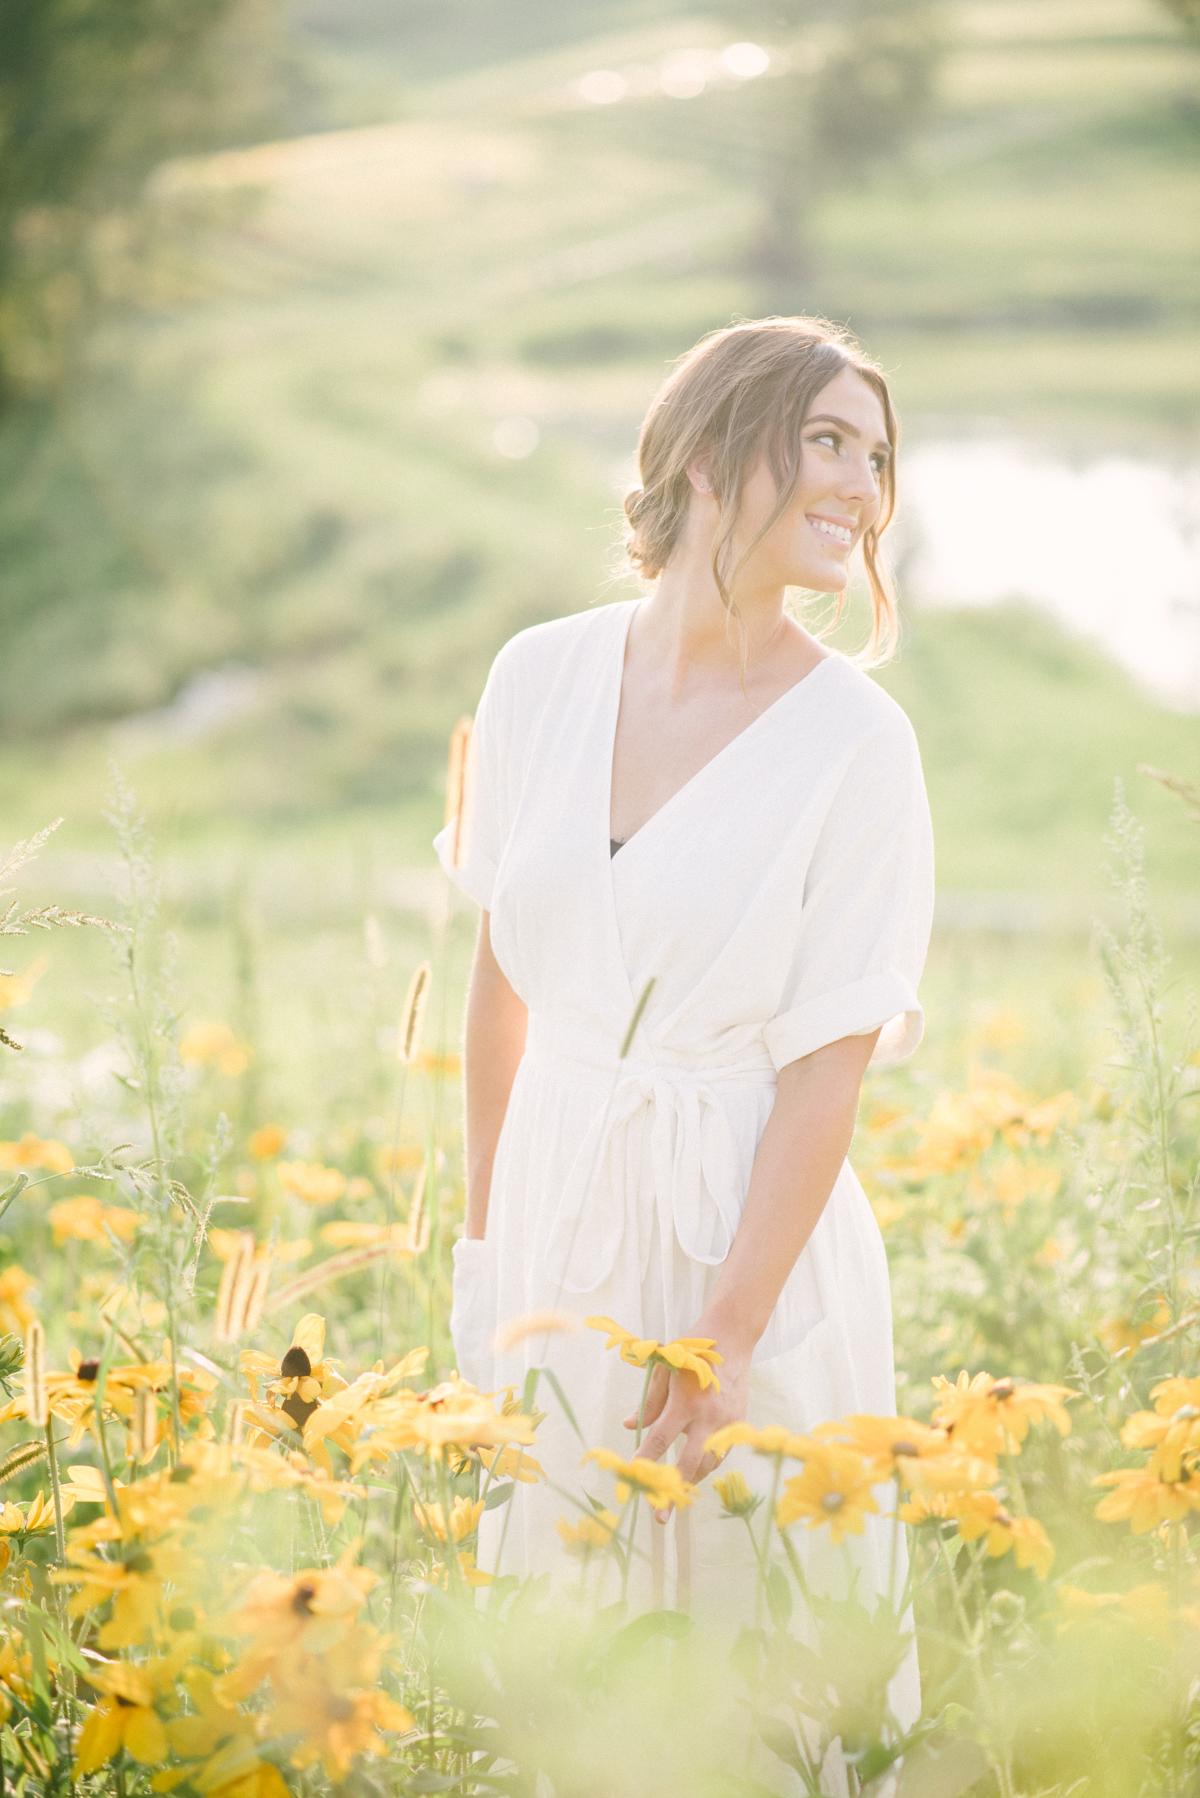 Eva Lin Photography 8.6.18-21.jpg